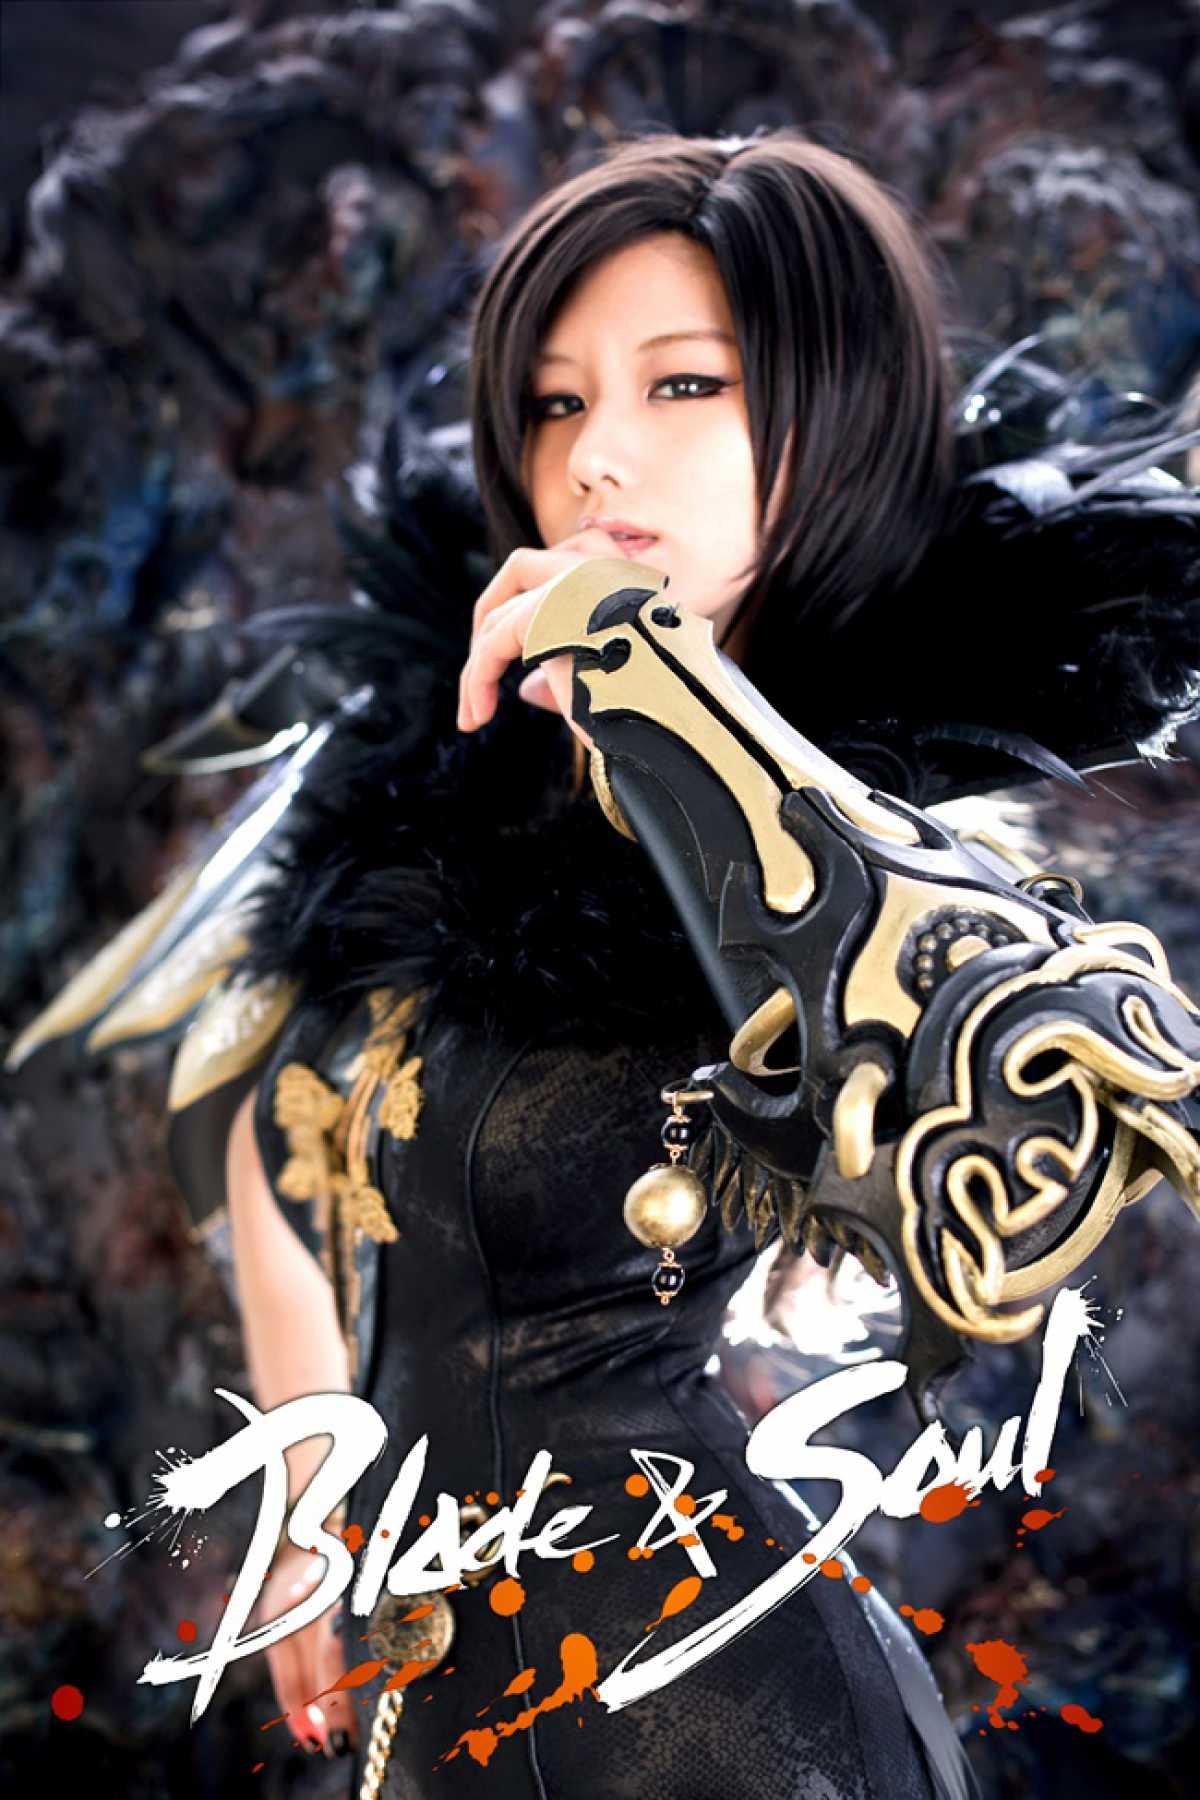 Косплей недели: Blade & Soul и злодейка Jin Seo Yeon